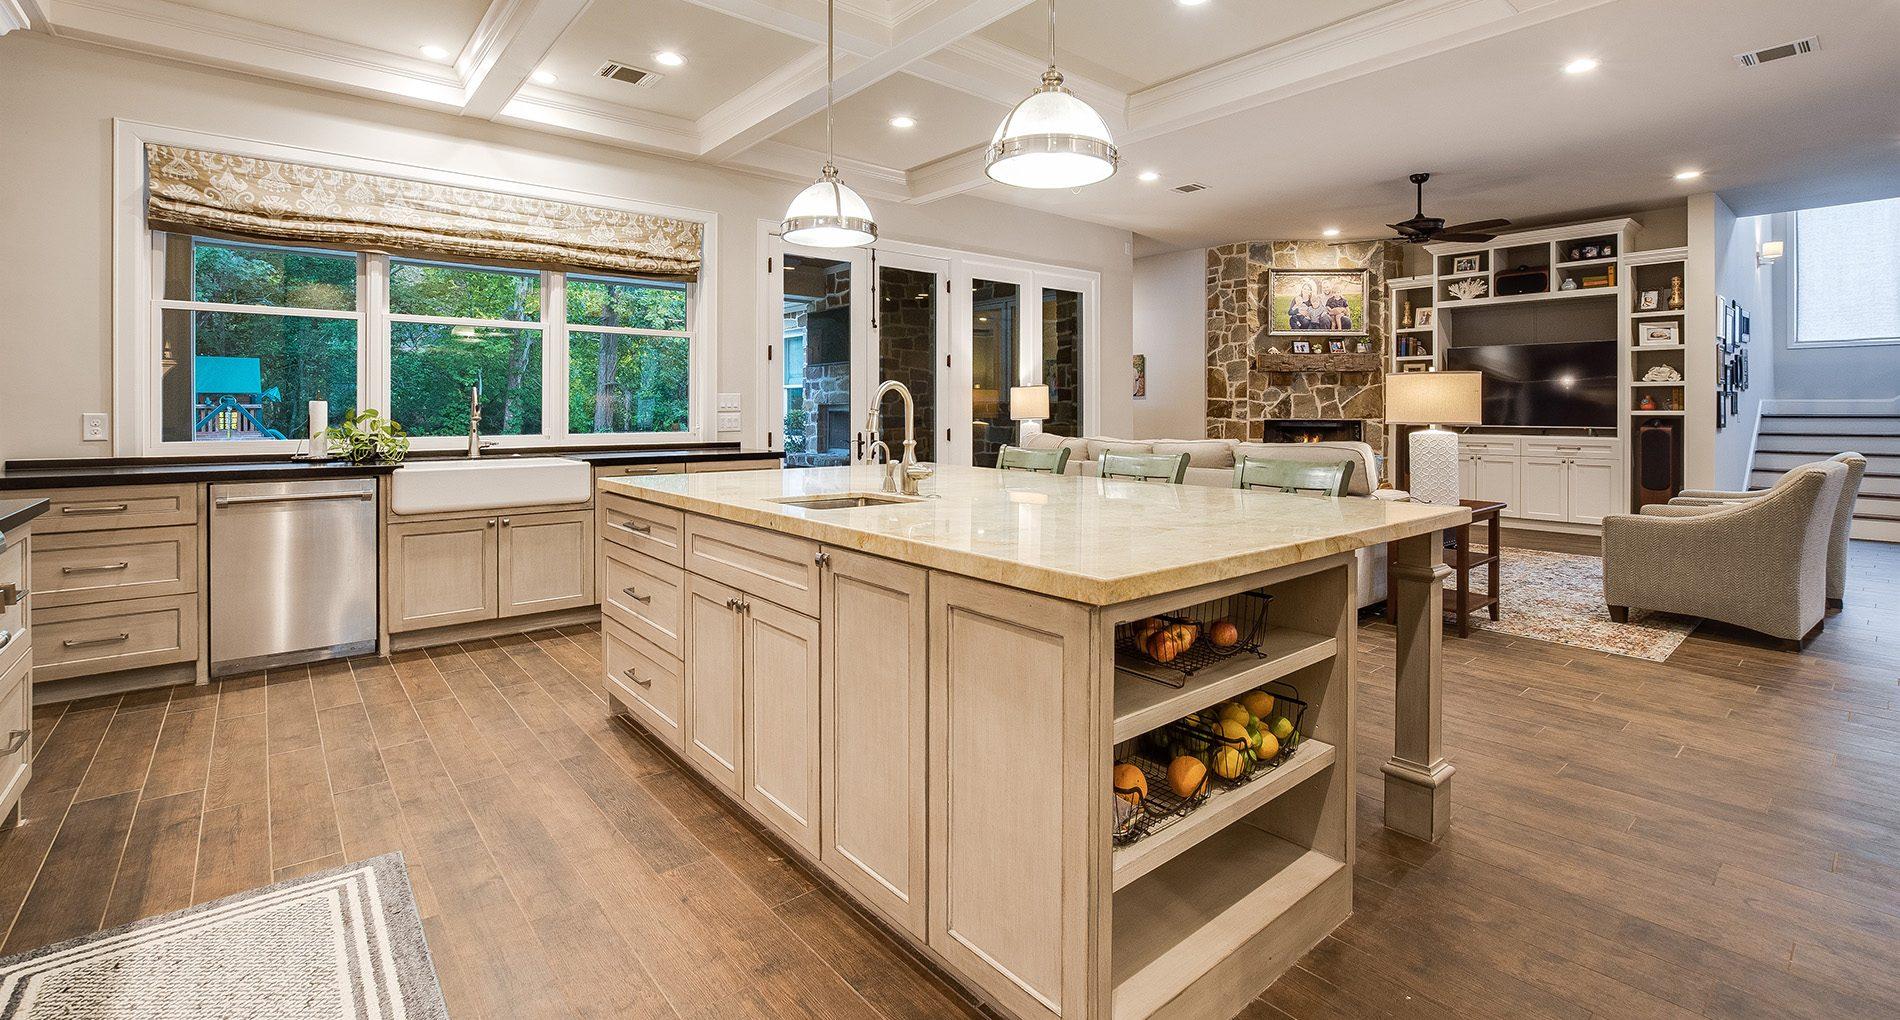 Kitchen Remodeling & Design in Houston | Alair Homes Houston